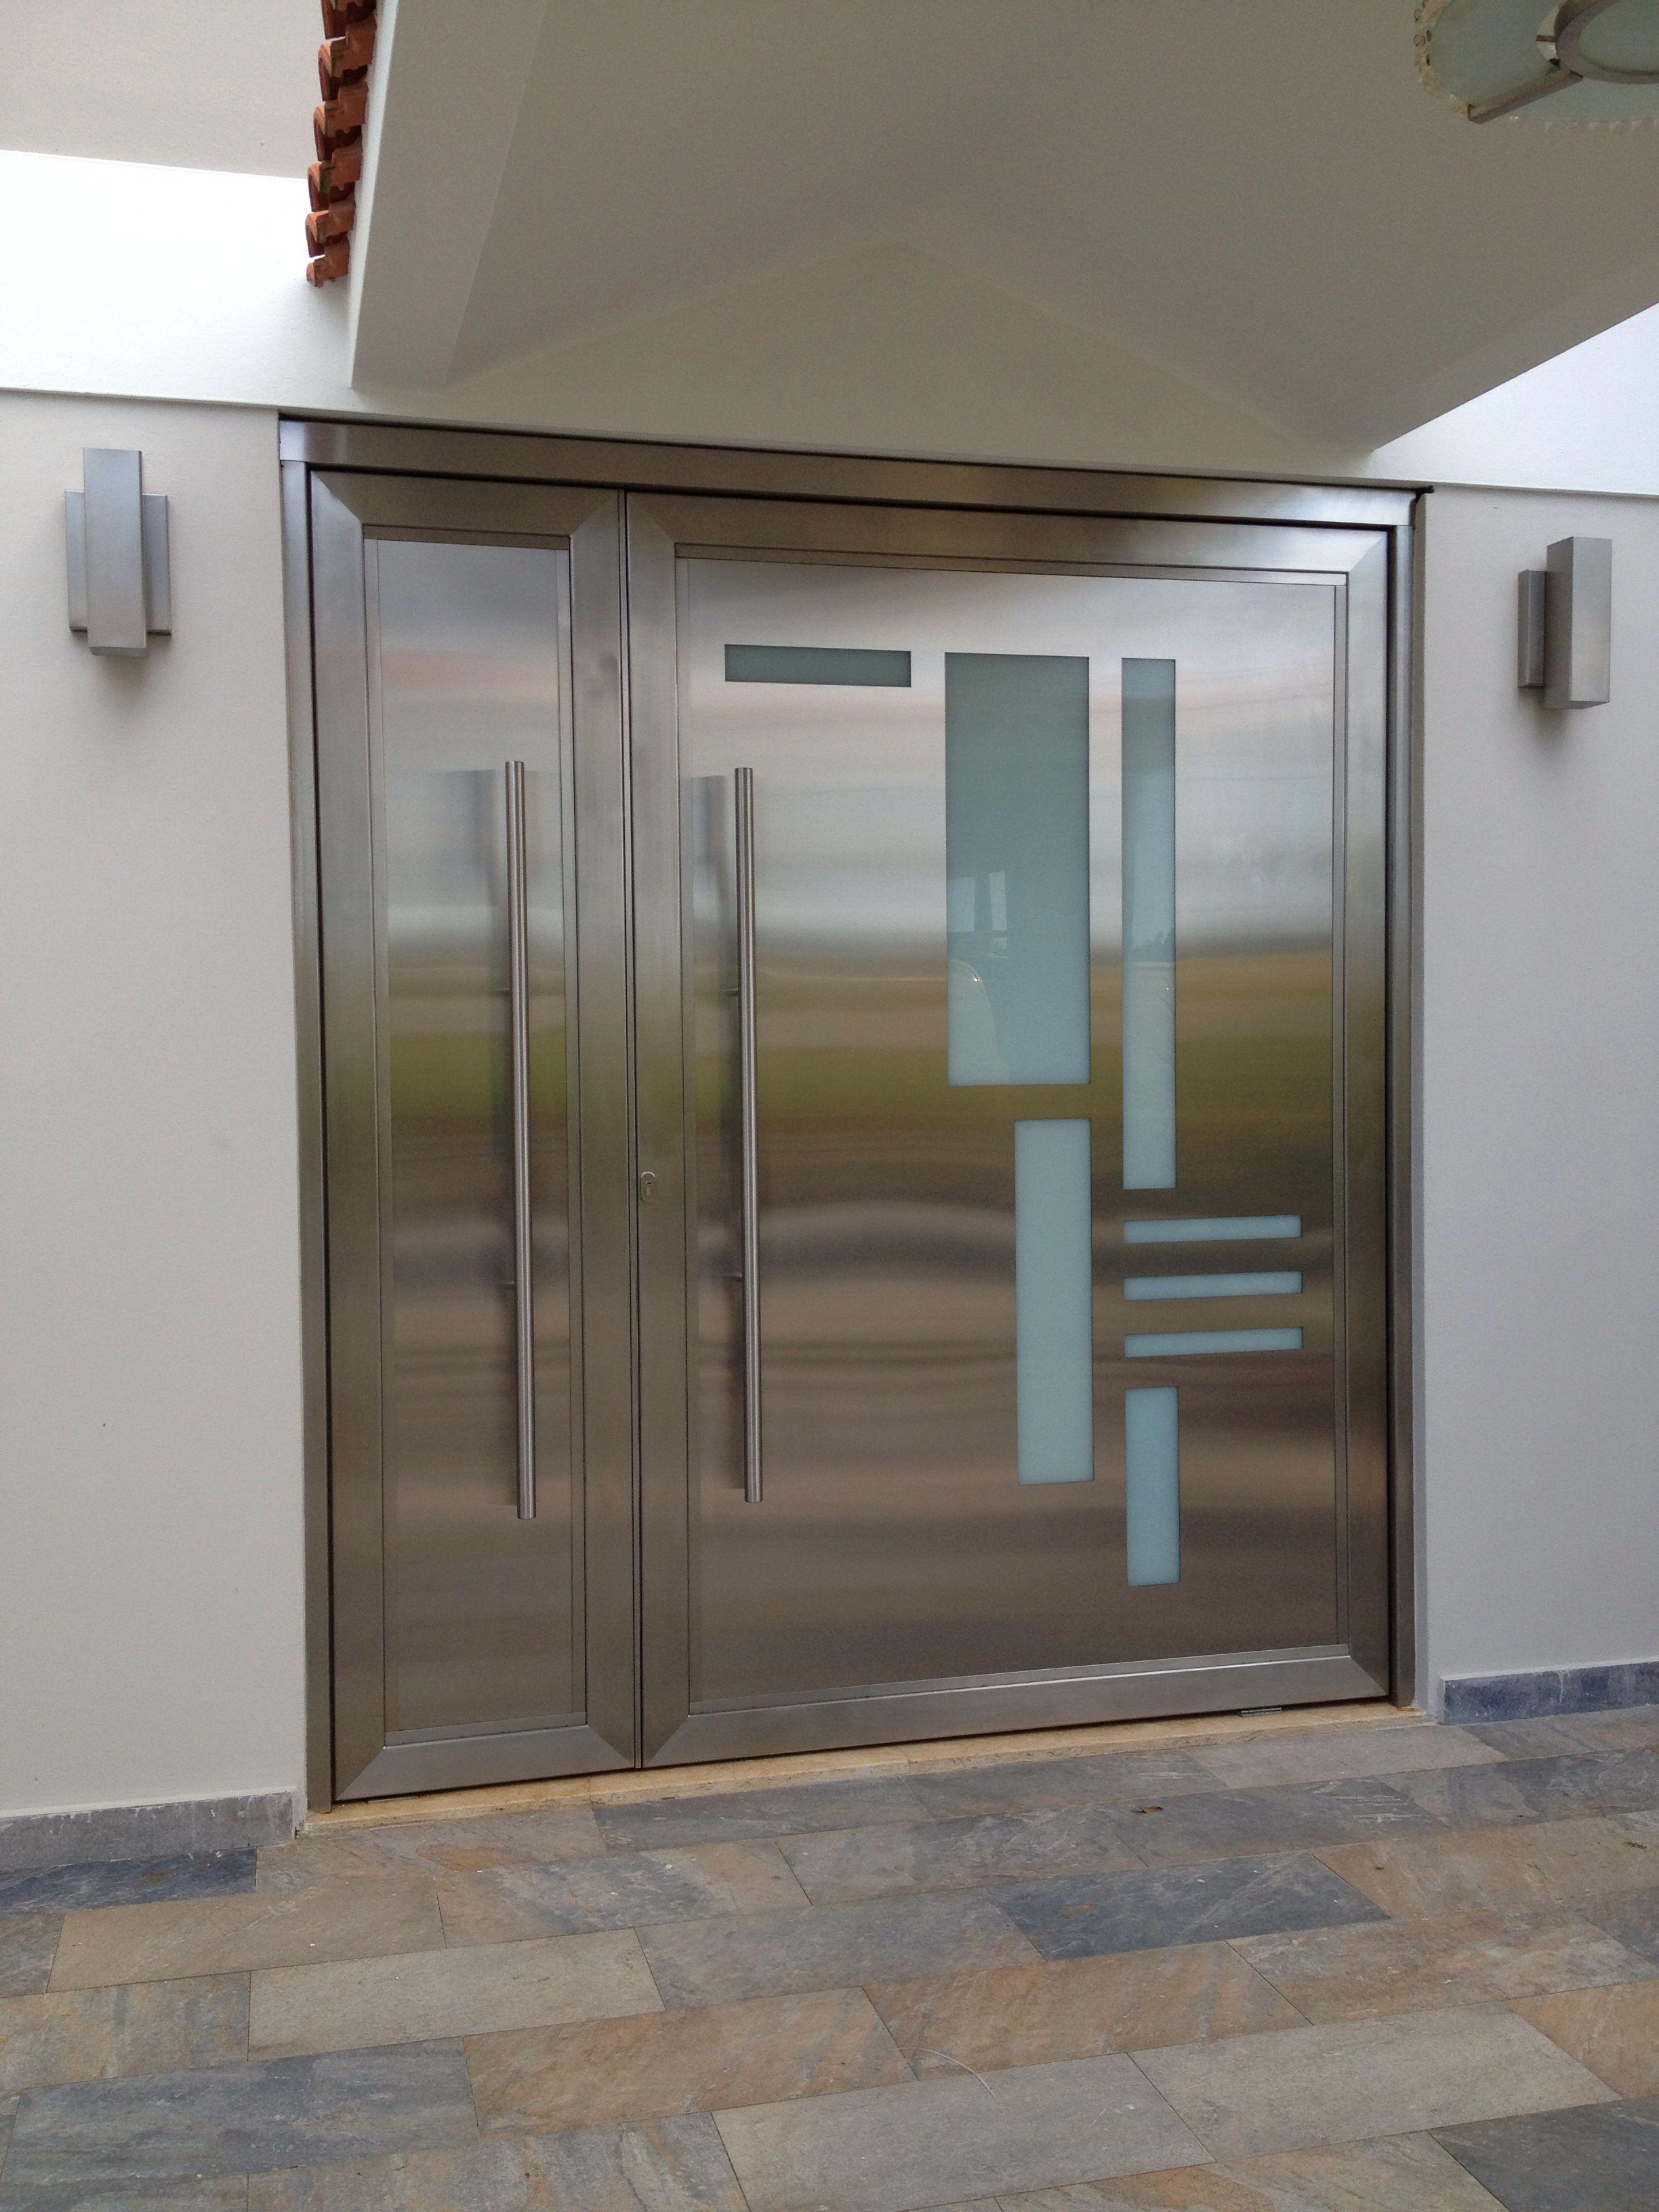 stainless steel pivot door   My Work 2   Pinterest   Pivot doors ... for Stainless Steel Gate Designs With Glass  75tgx